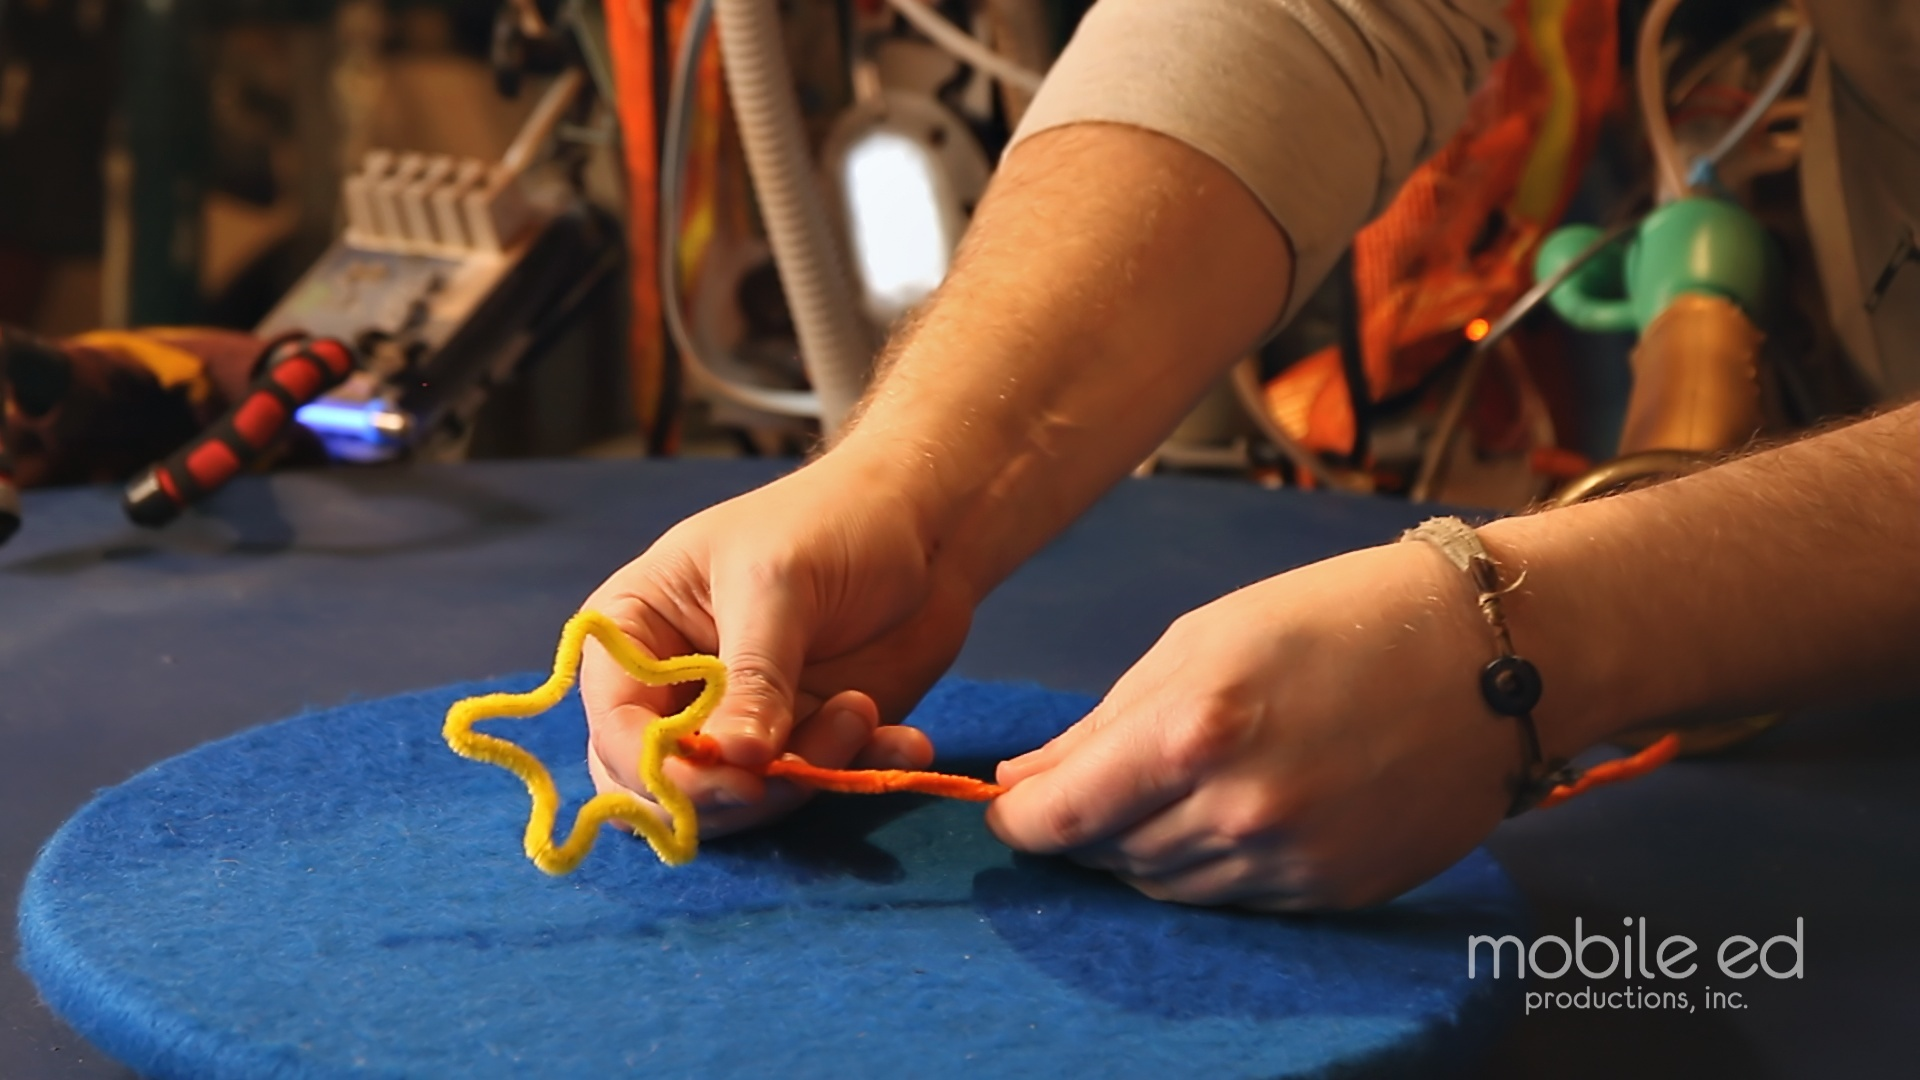 Creat the bubble wand handle | Handy Dan the Junkyard Man | Mobile Ed Productions